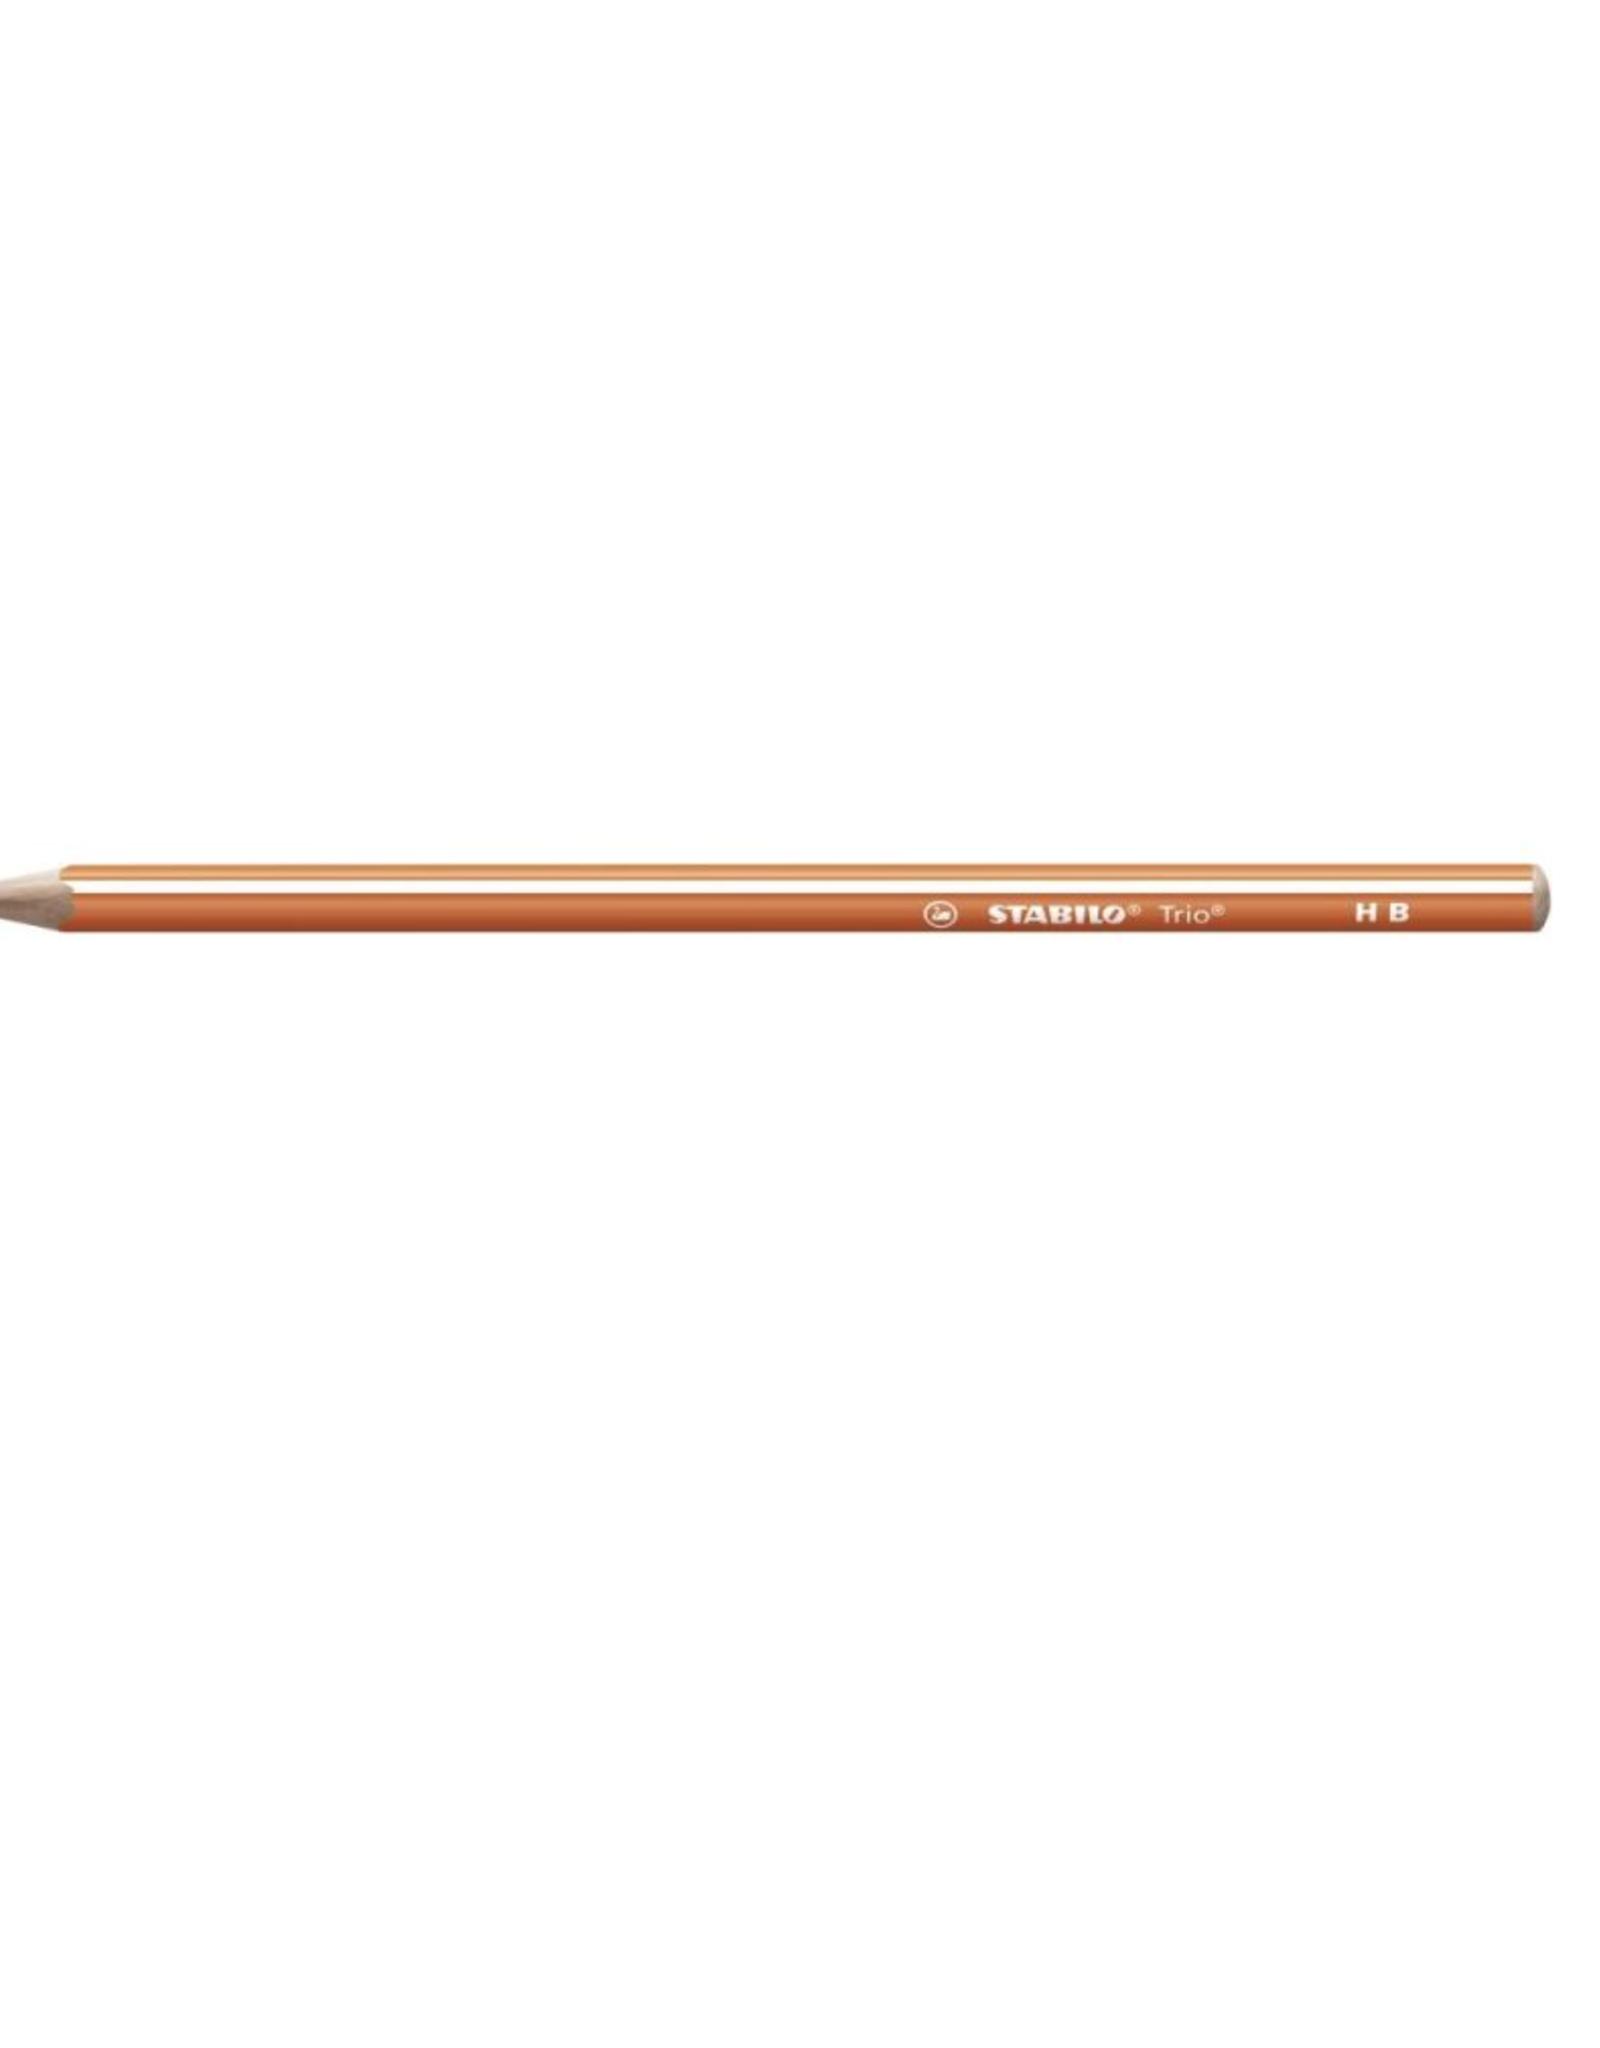 Stabilo Stabilo Trio Pencil Orange (369/03-HB)